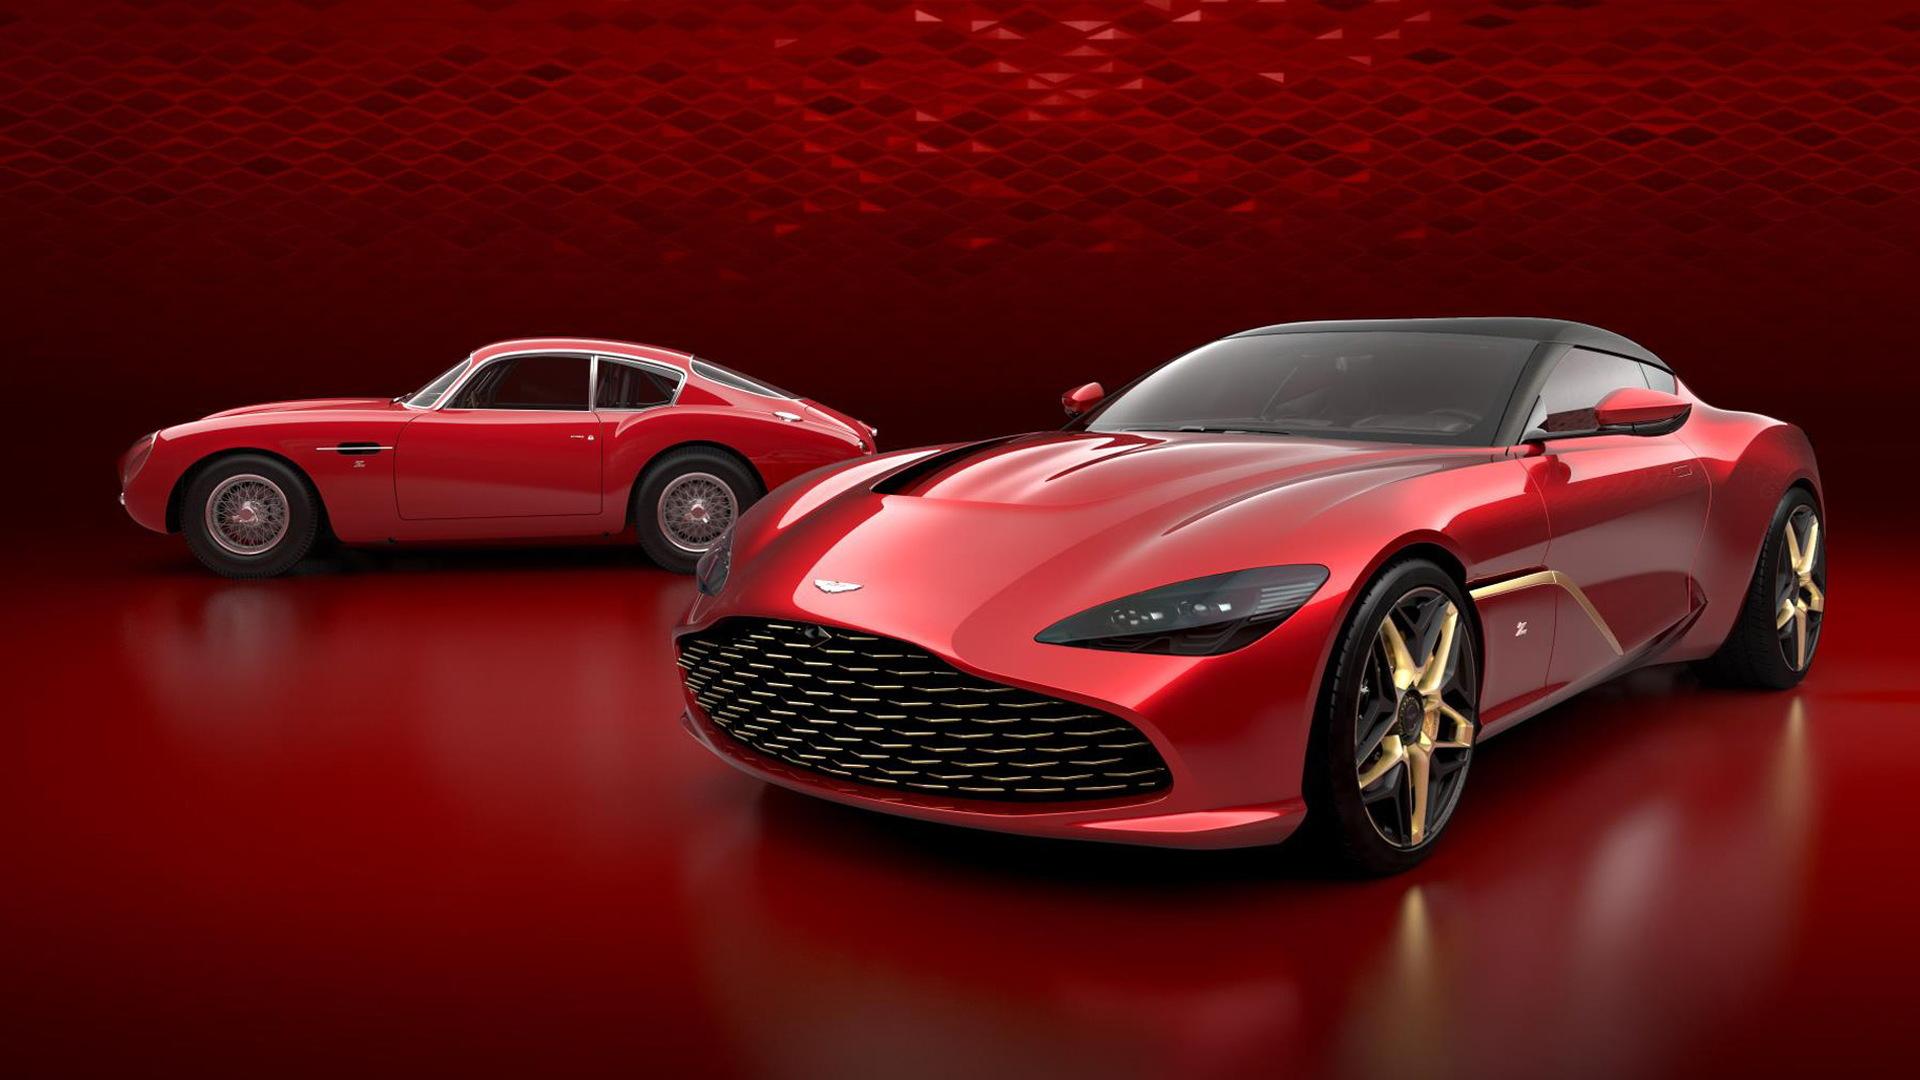 Teaser for Aston Martin DBS GT Zagato and DB4 GT Zagato continuation car